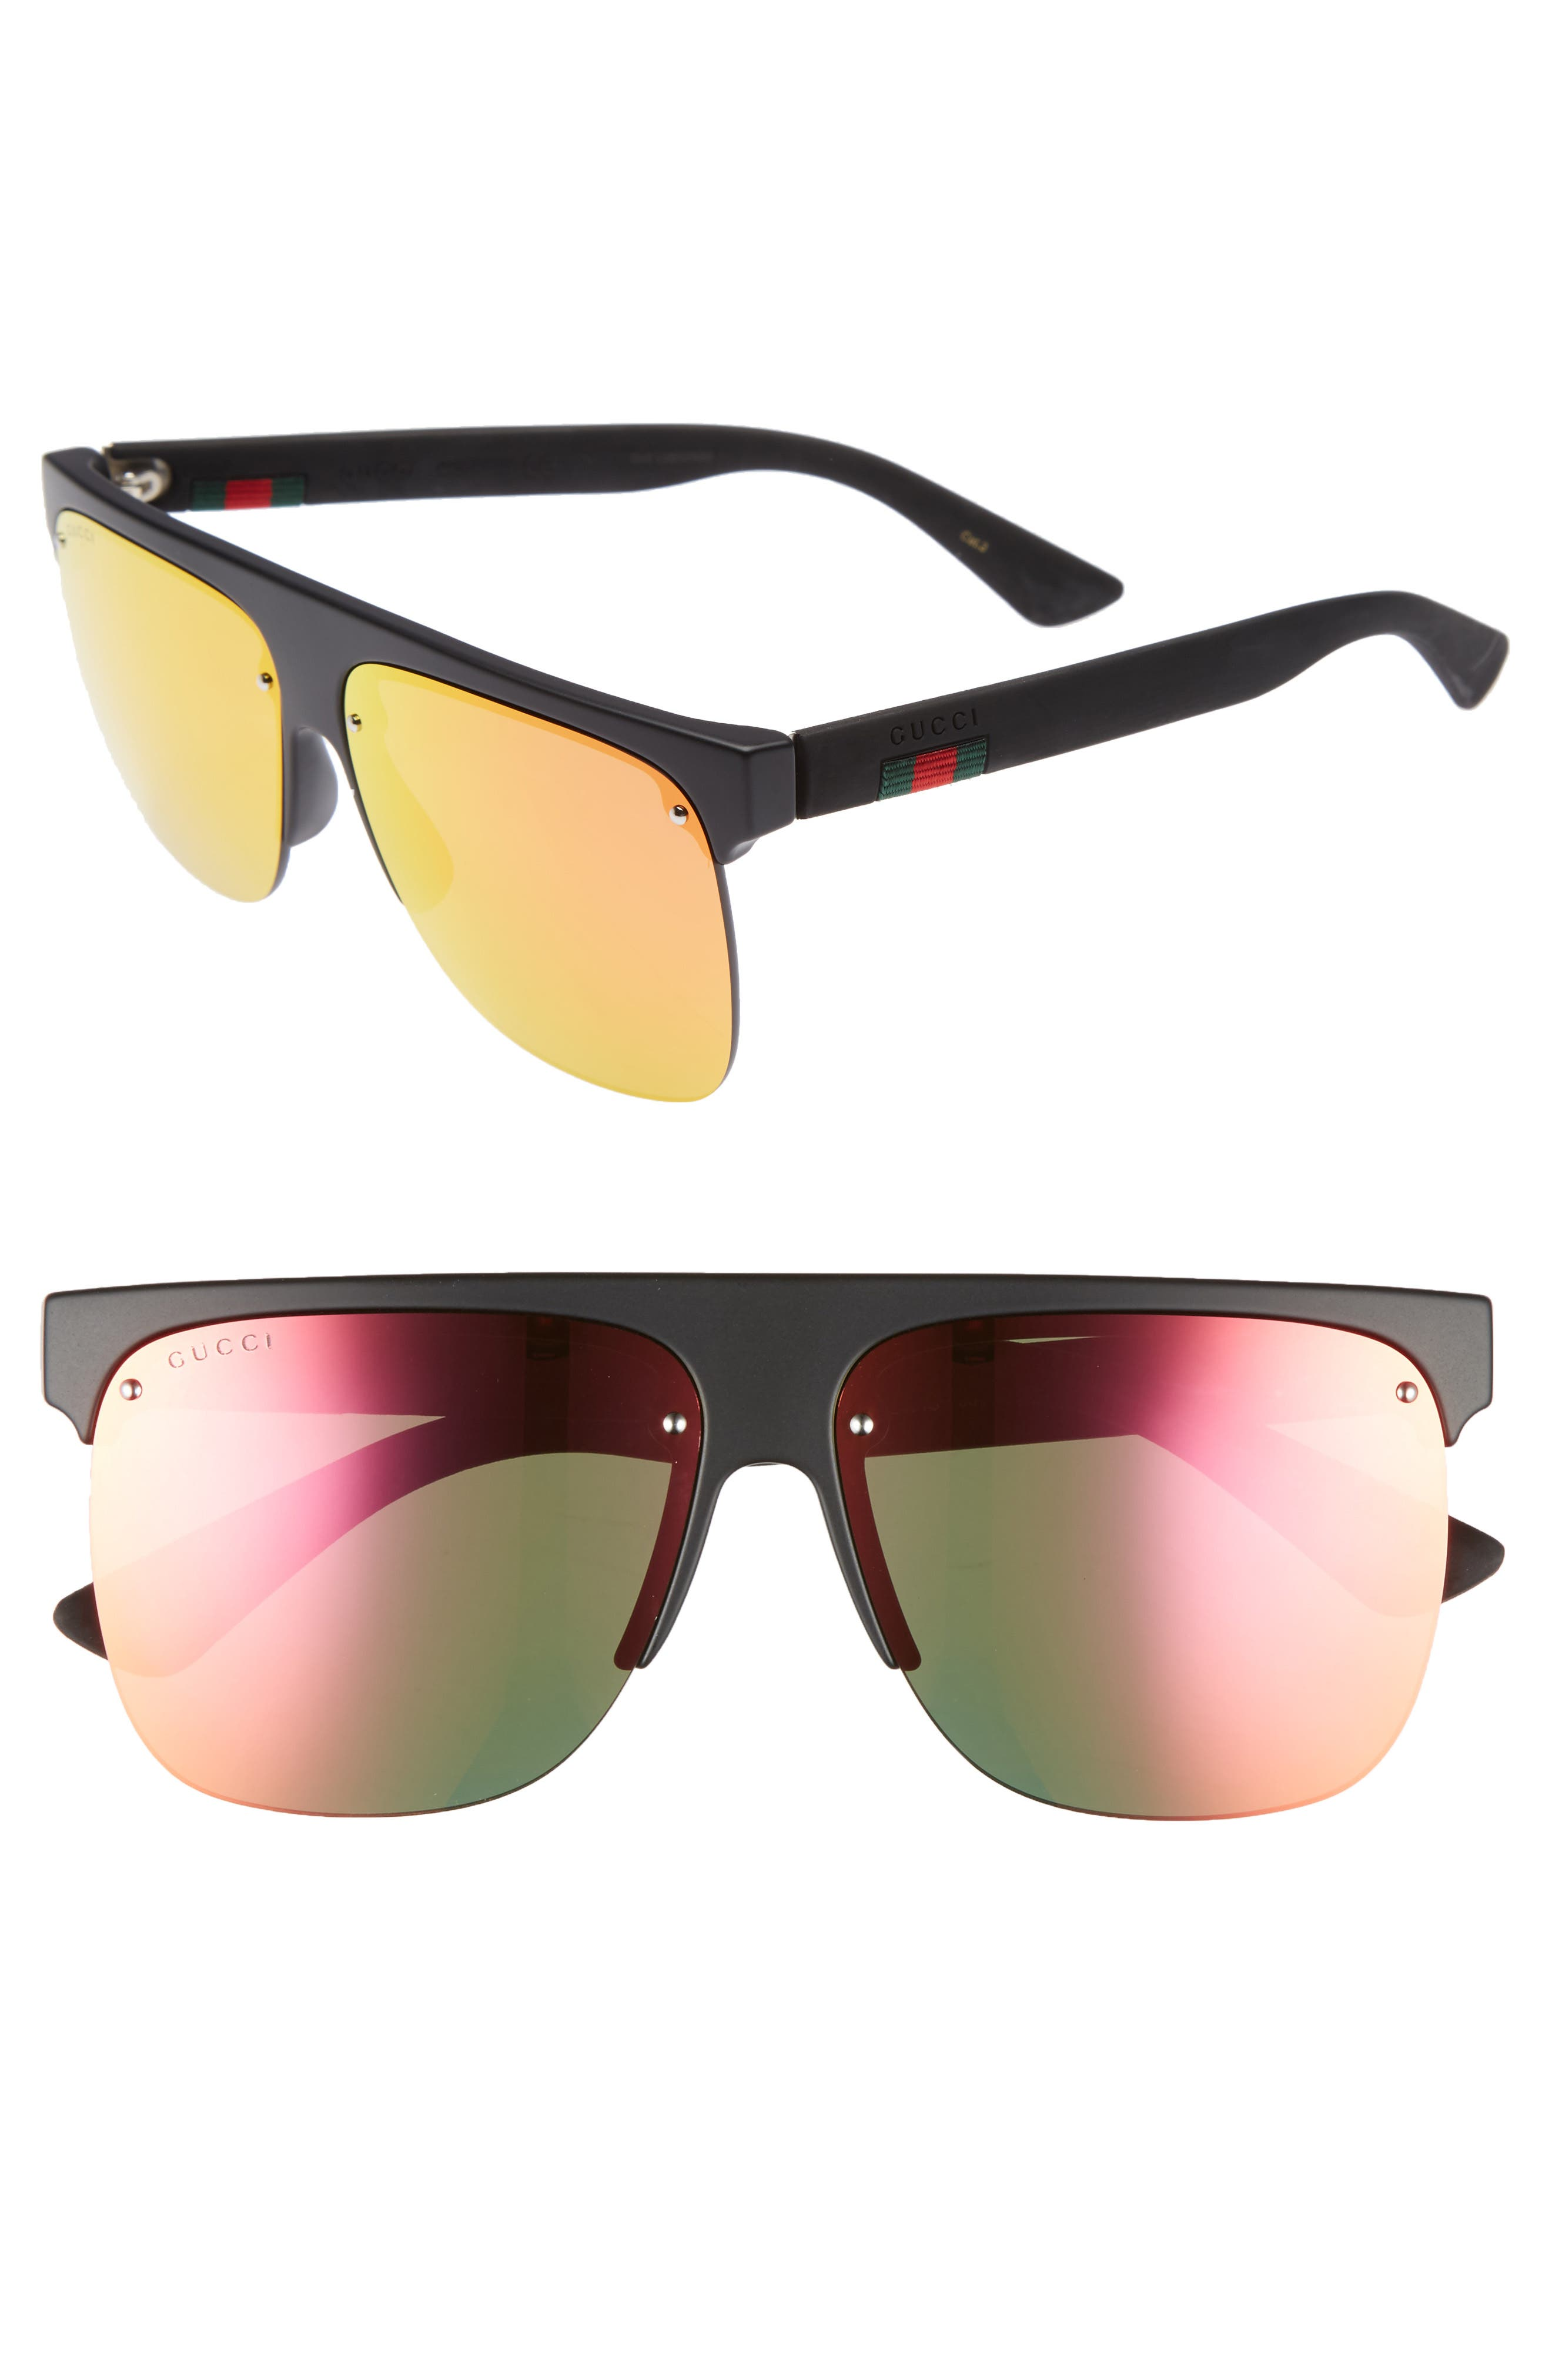 60mm Semi Rimless Polarized Sunglasses,                             Main thumbnail 1, color,                             001